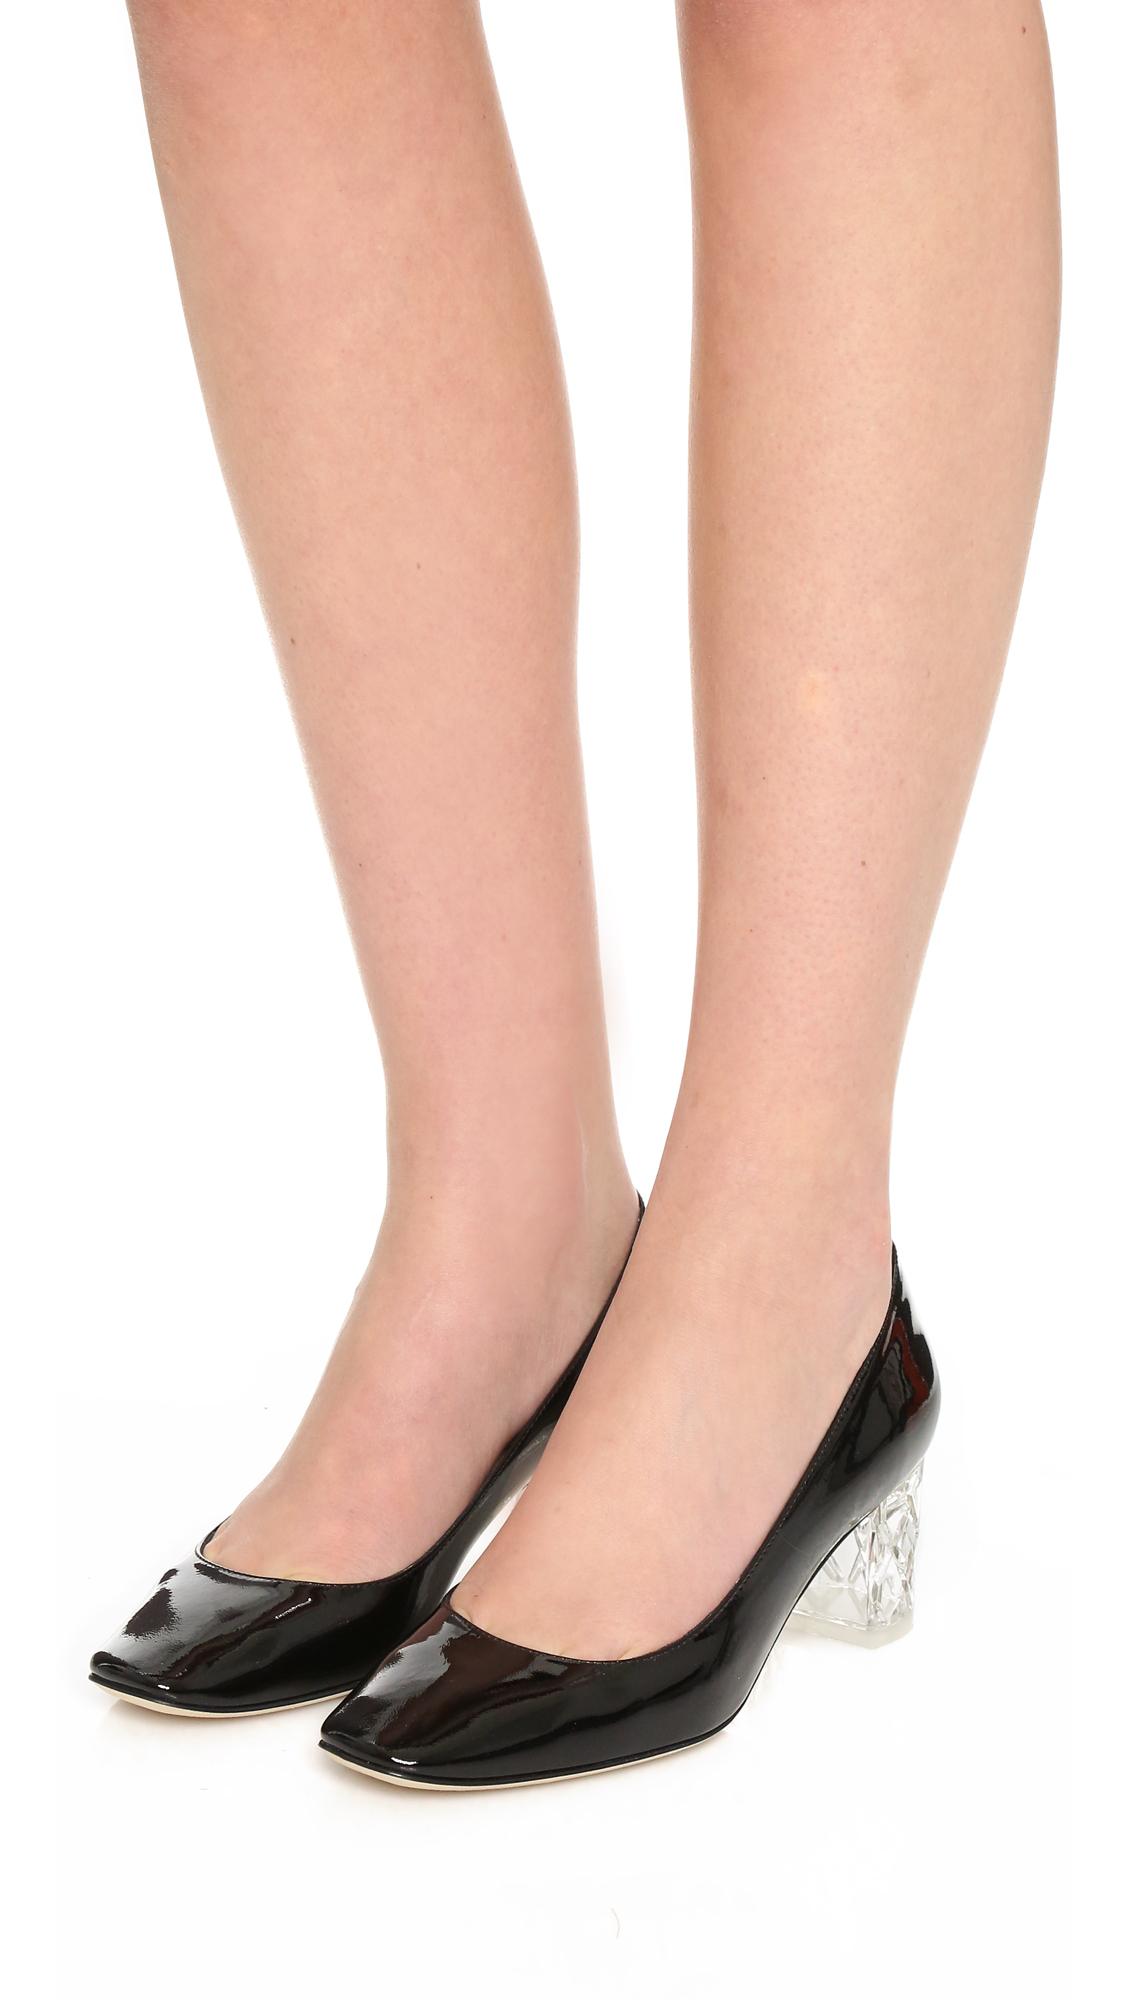 8f0da322233b Lyst - Kate Spade Dawson Too Block Heel Pumps in Black